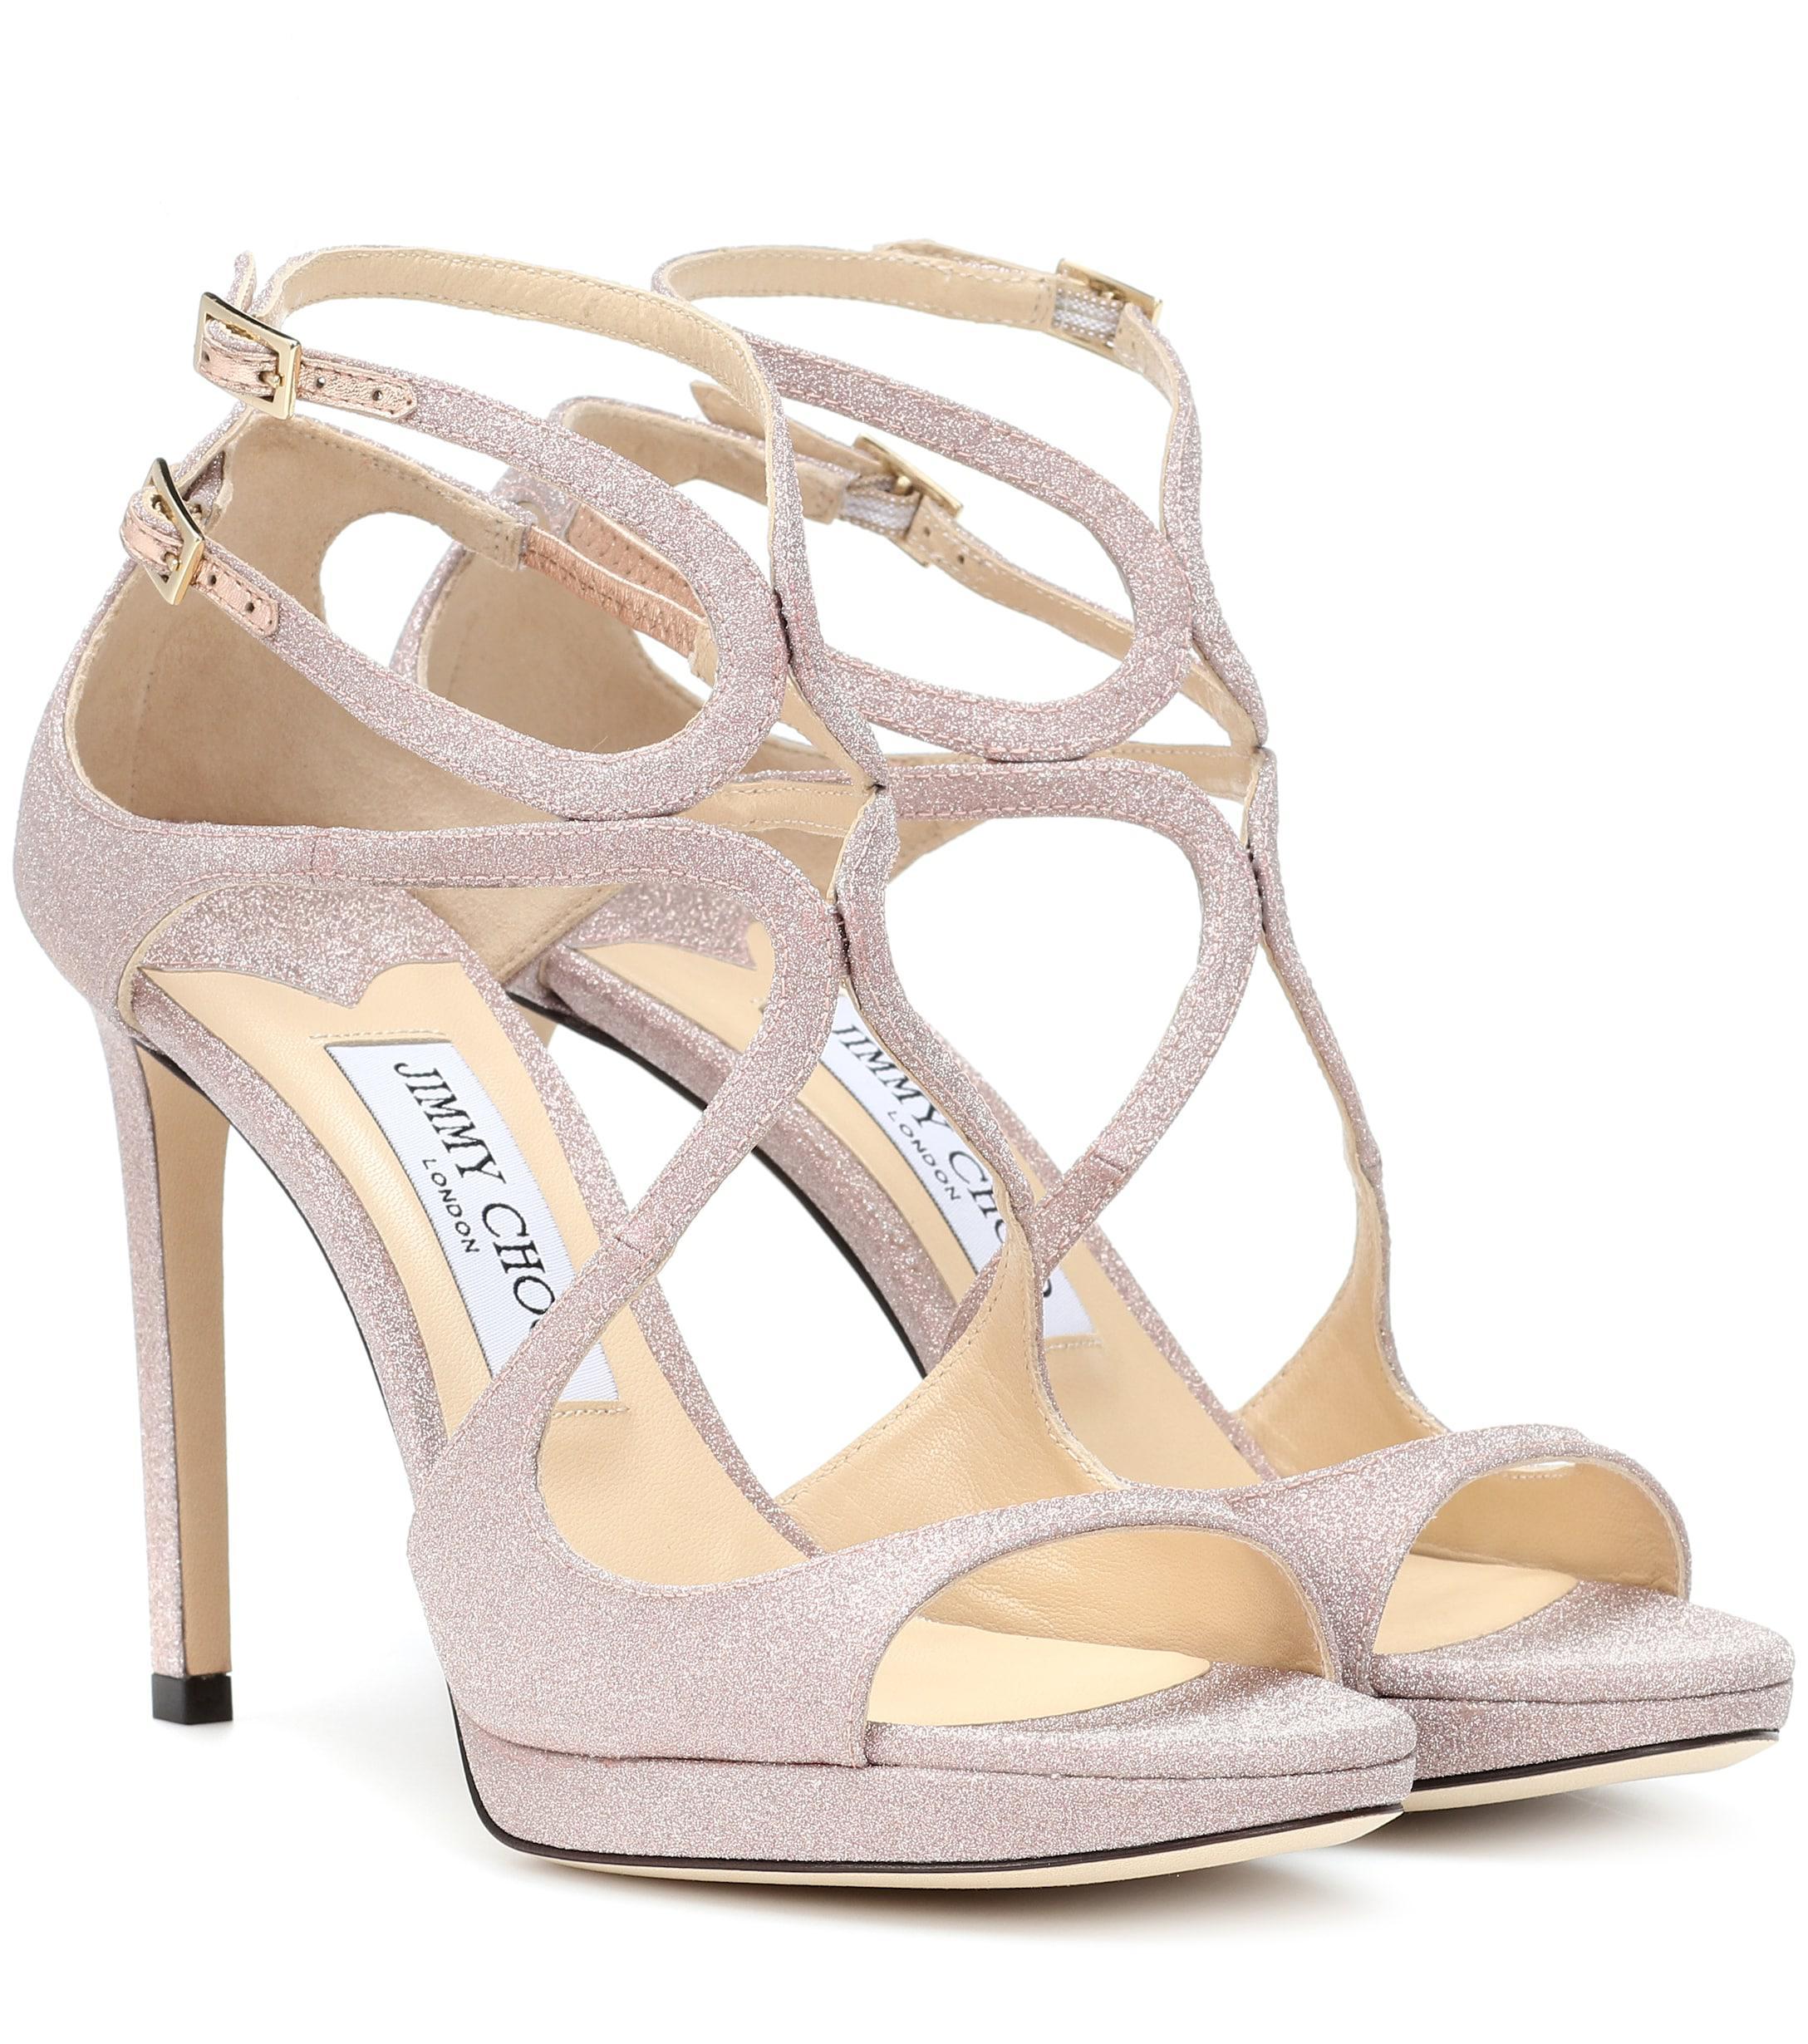 7cd6008886bb Jimmy Choo. Women s Lance 100 Glitter Sandals